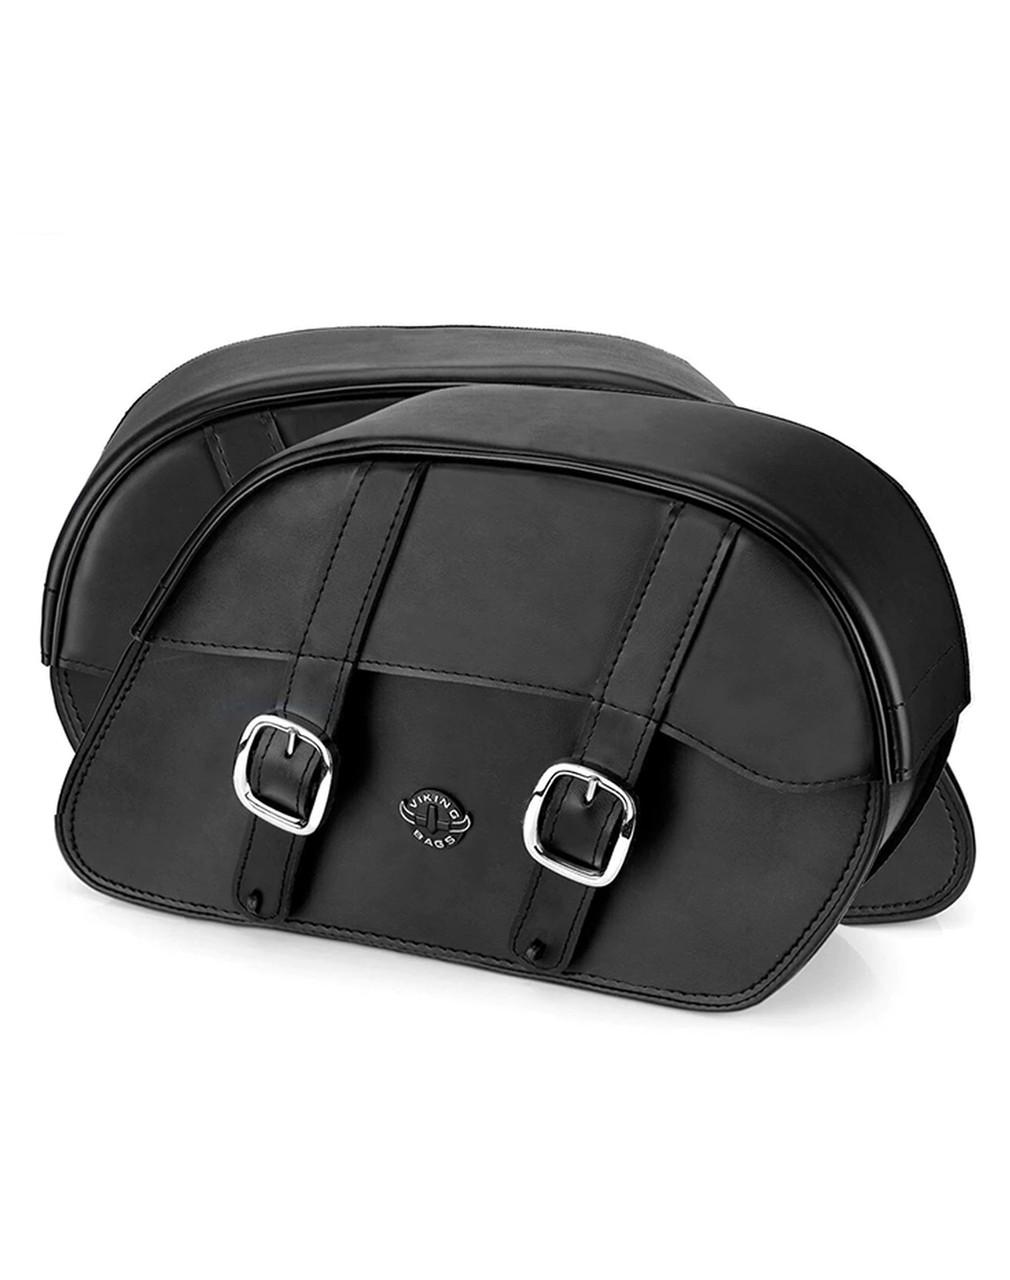 Honda VTX 1800 R Slanted L Motorcycle Saddlebags Both Bags View